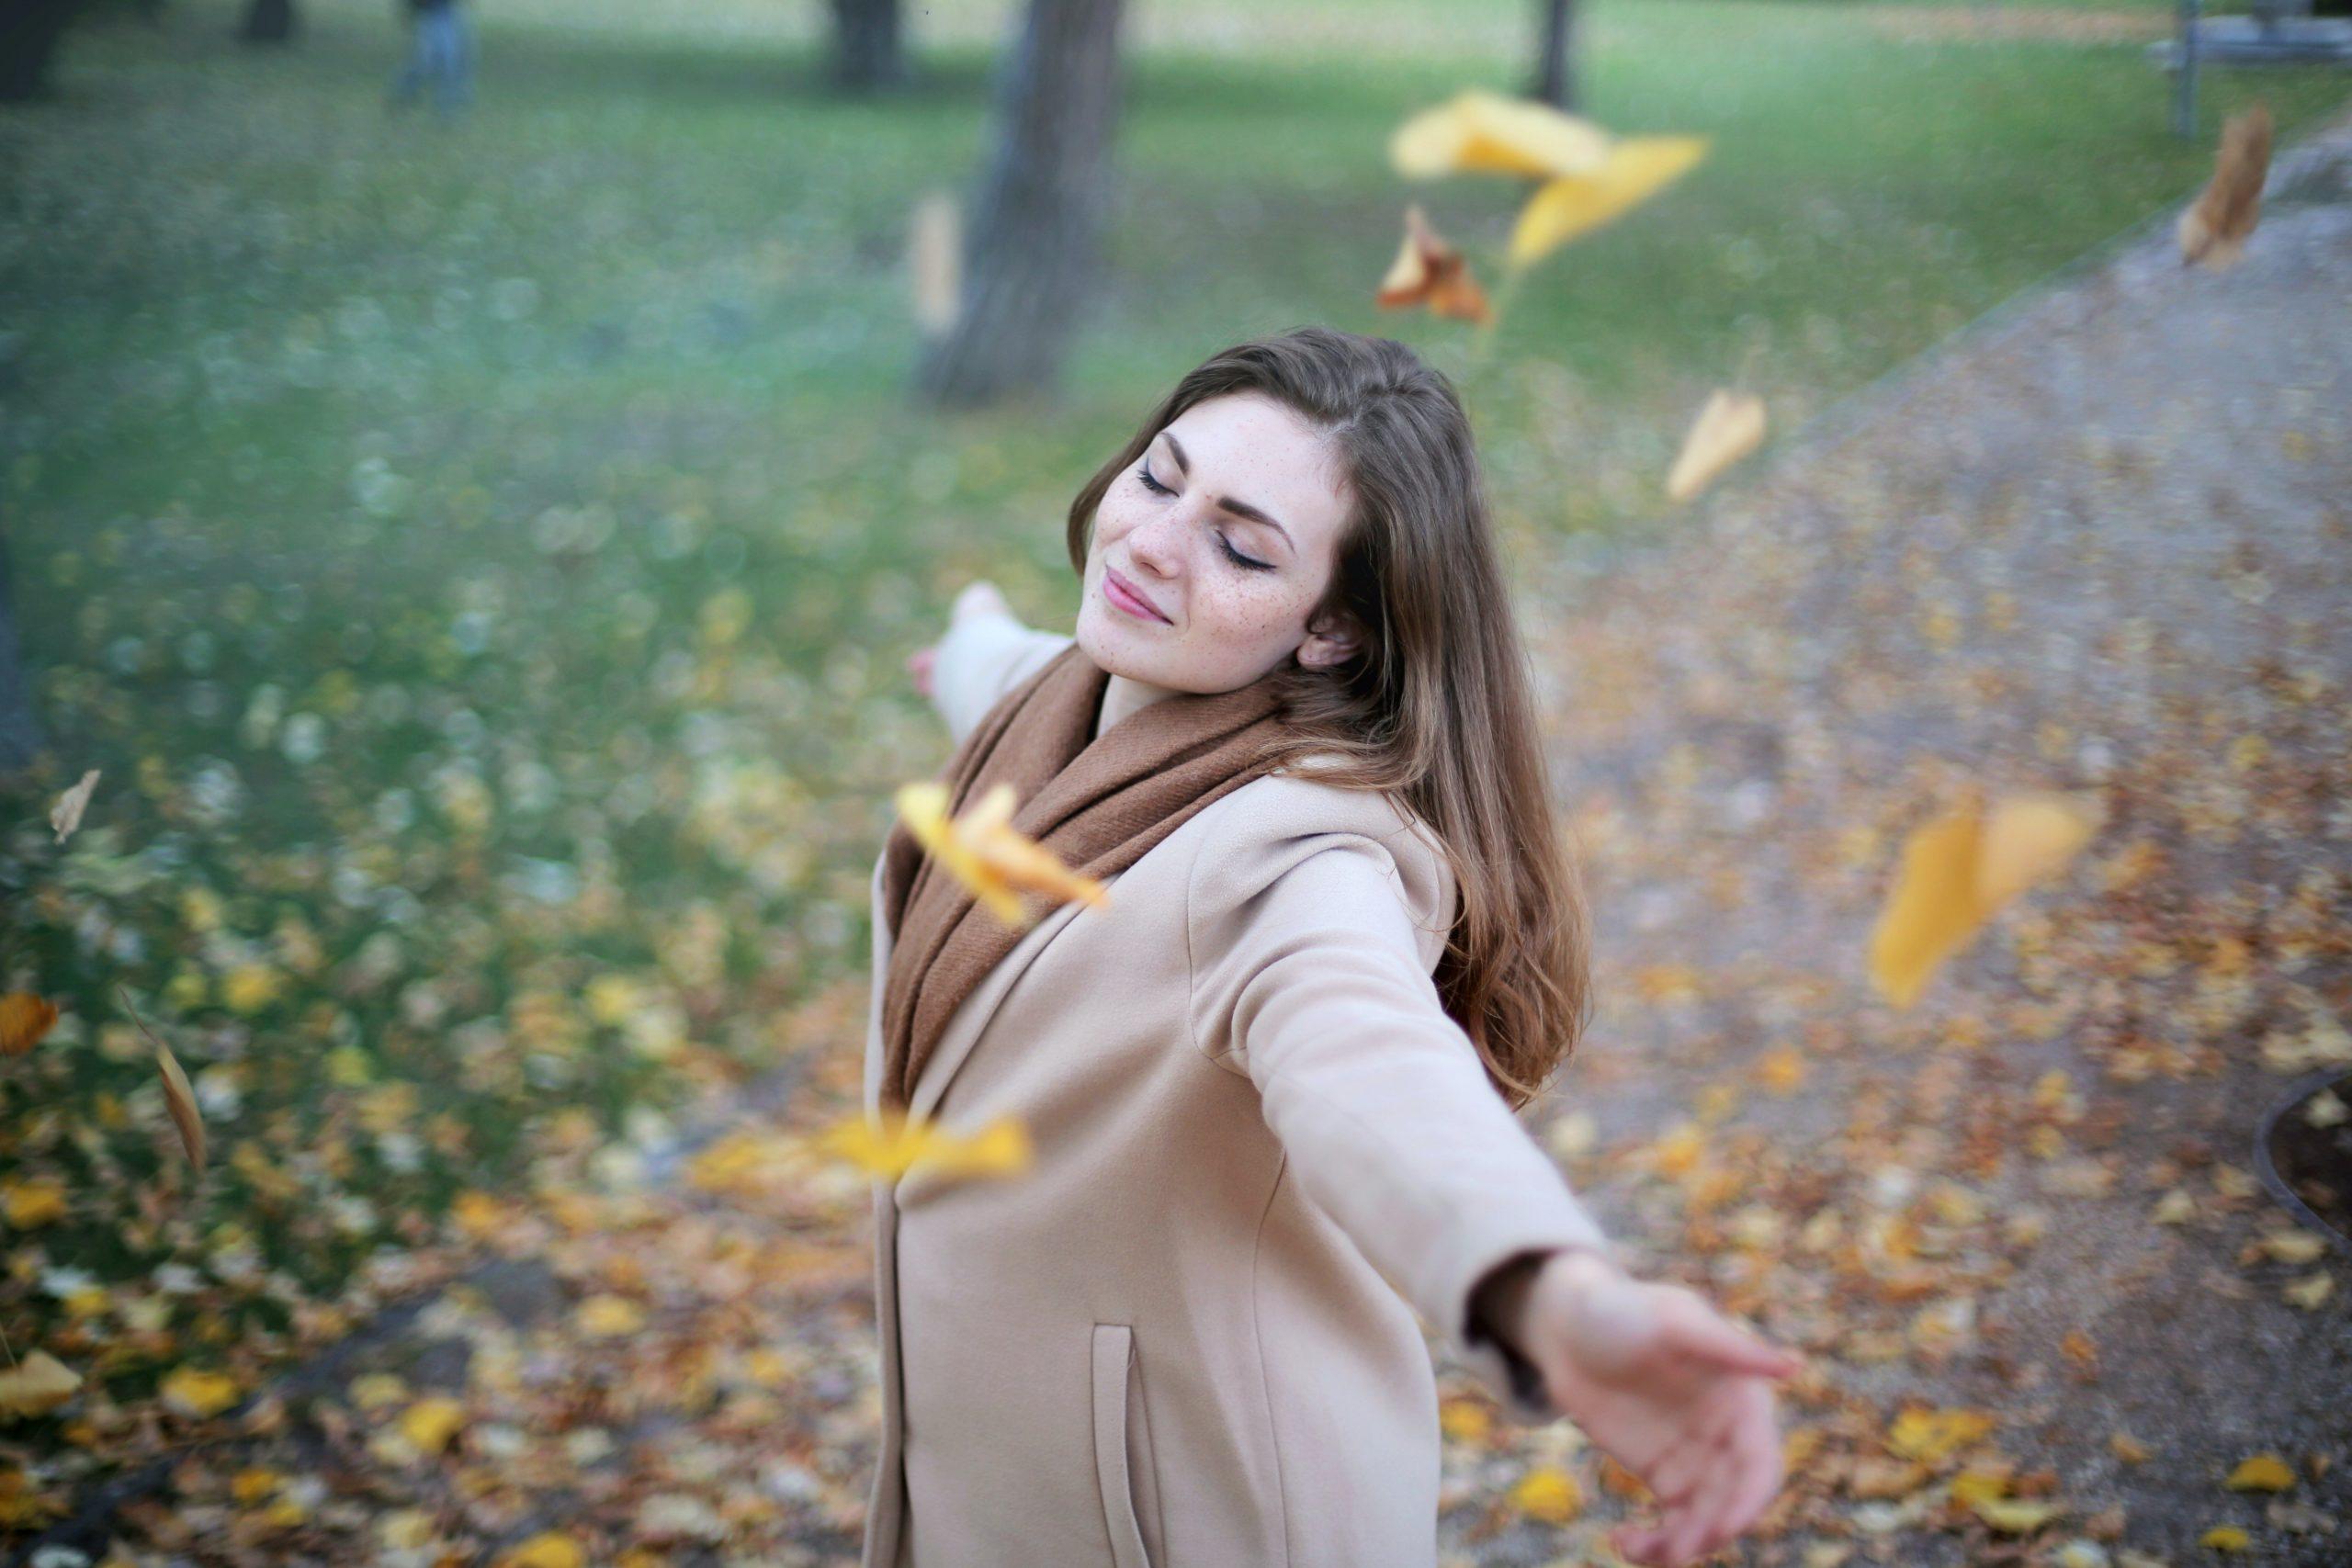 femme qui danse automne